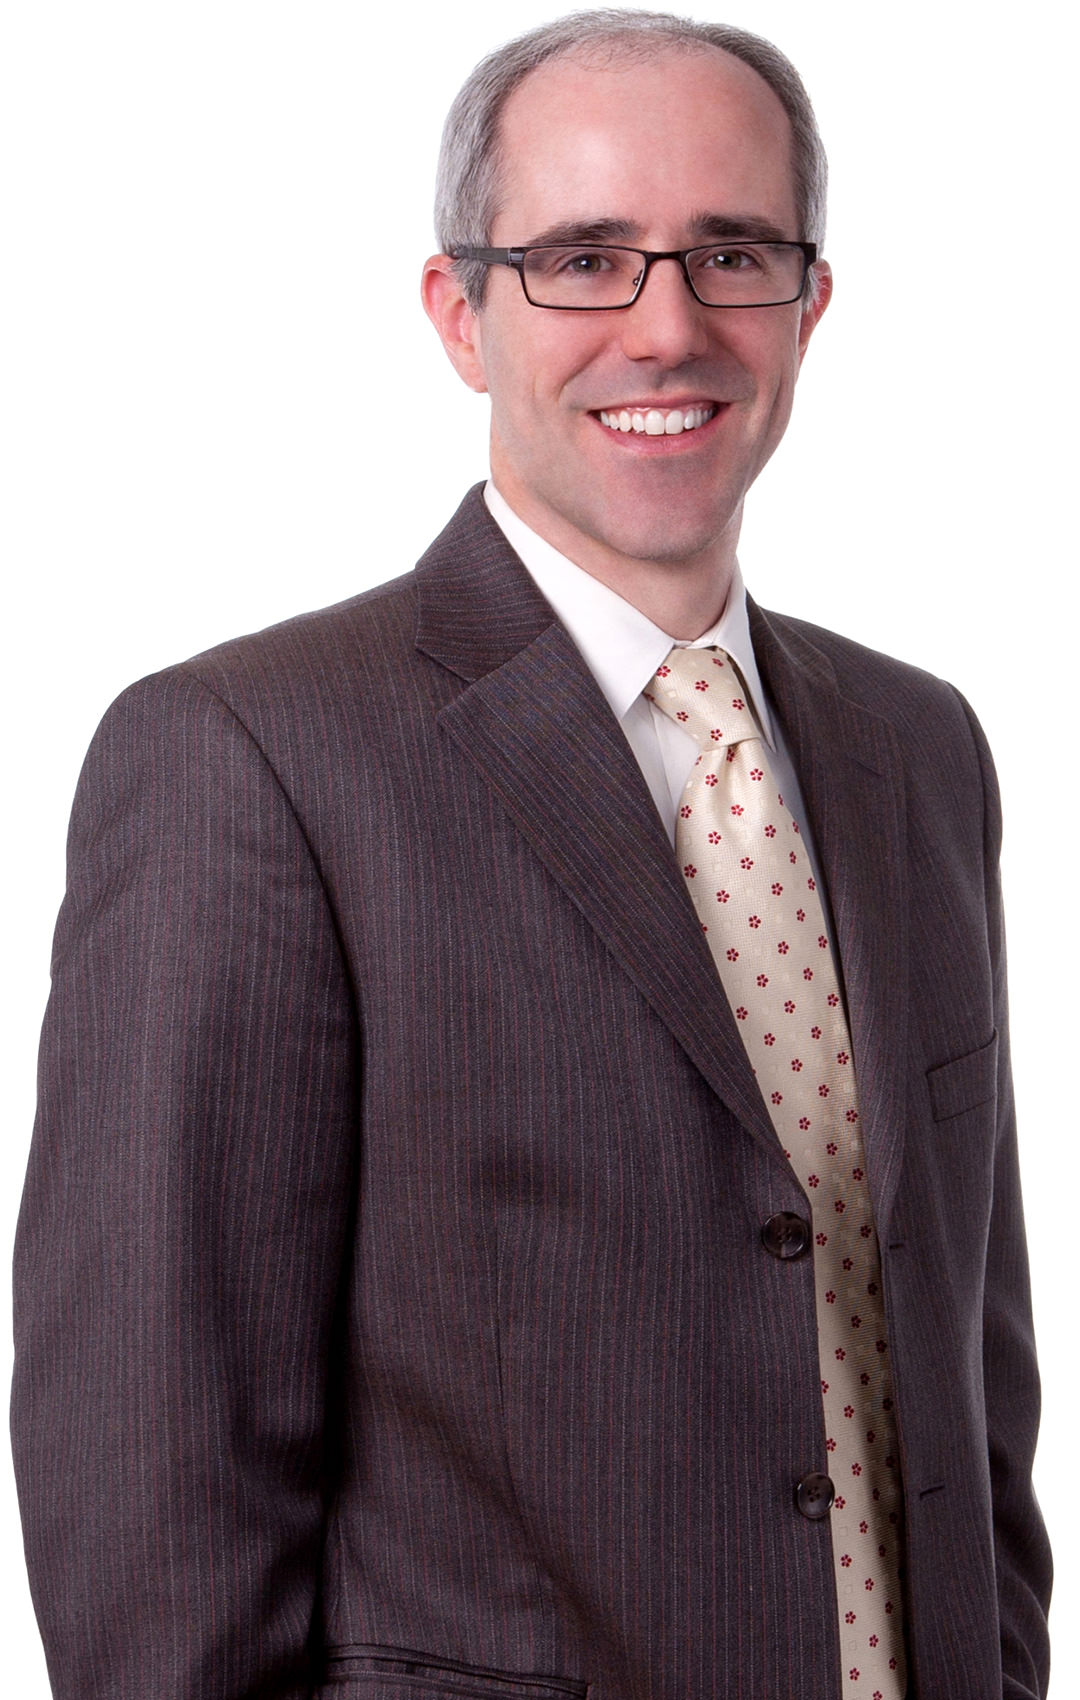 D. Martin Warf